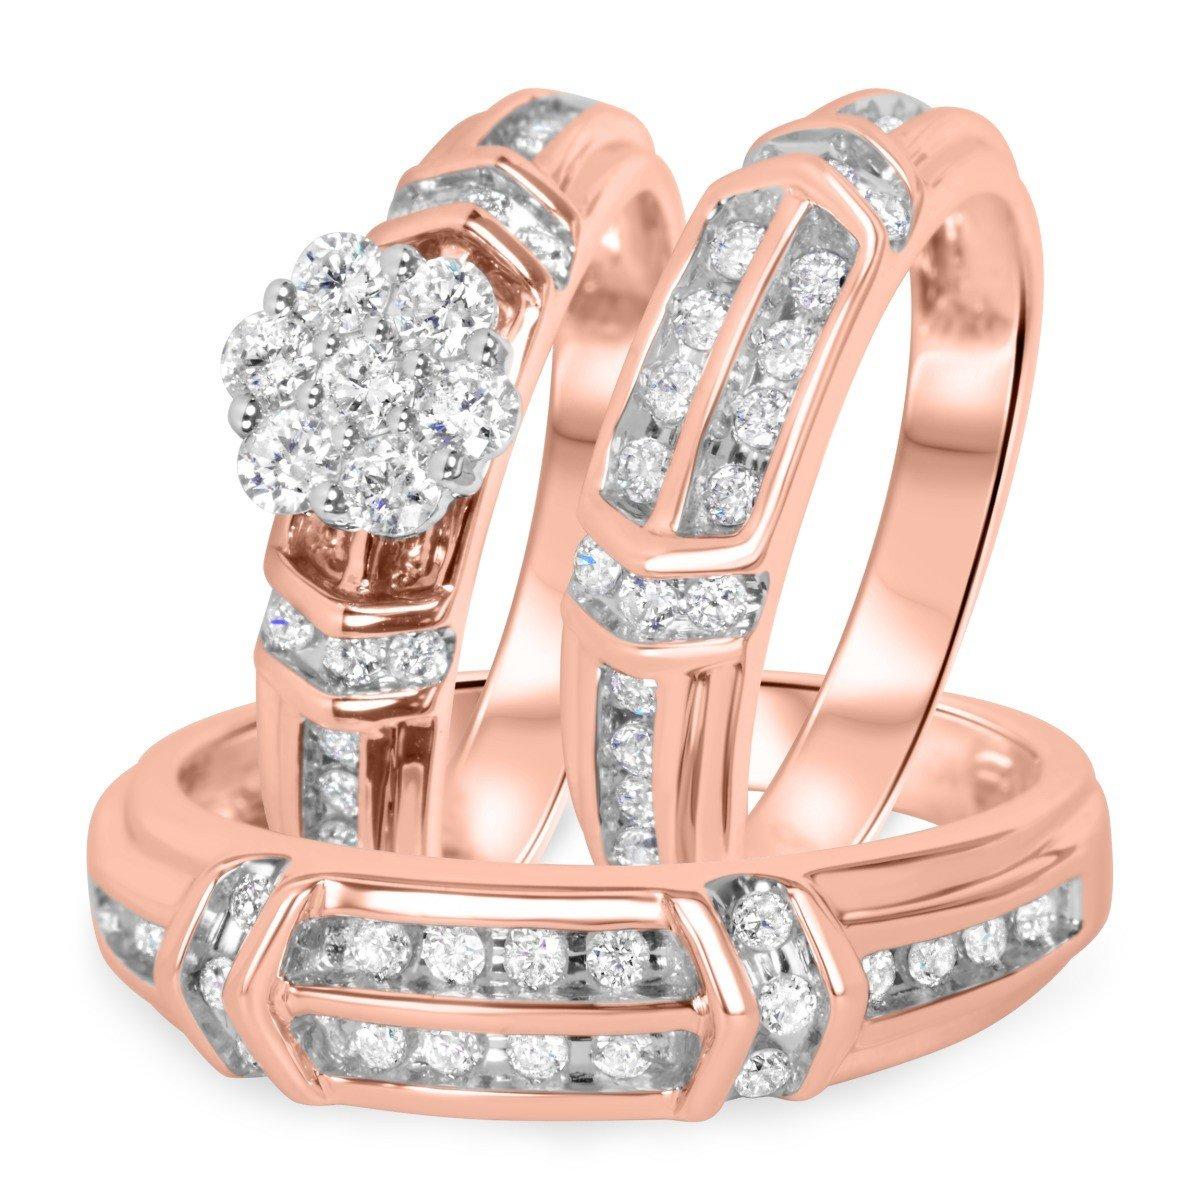 Smjewels 1 1/10 Ct Sim Diamond Men's/Women's Engagement Ring Trio Bridal Set 14K Rose Gold Fn